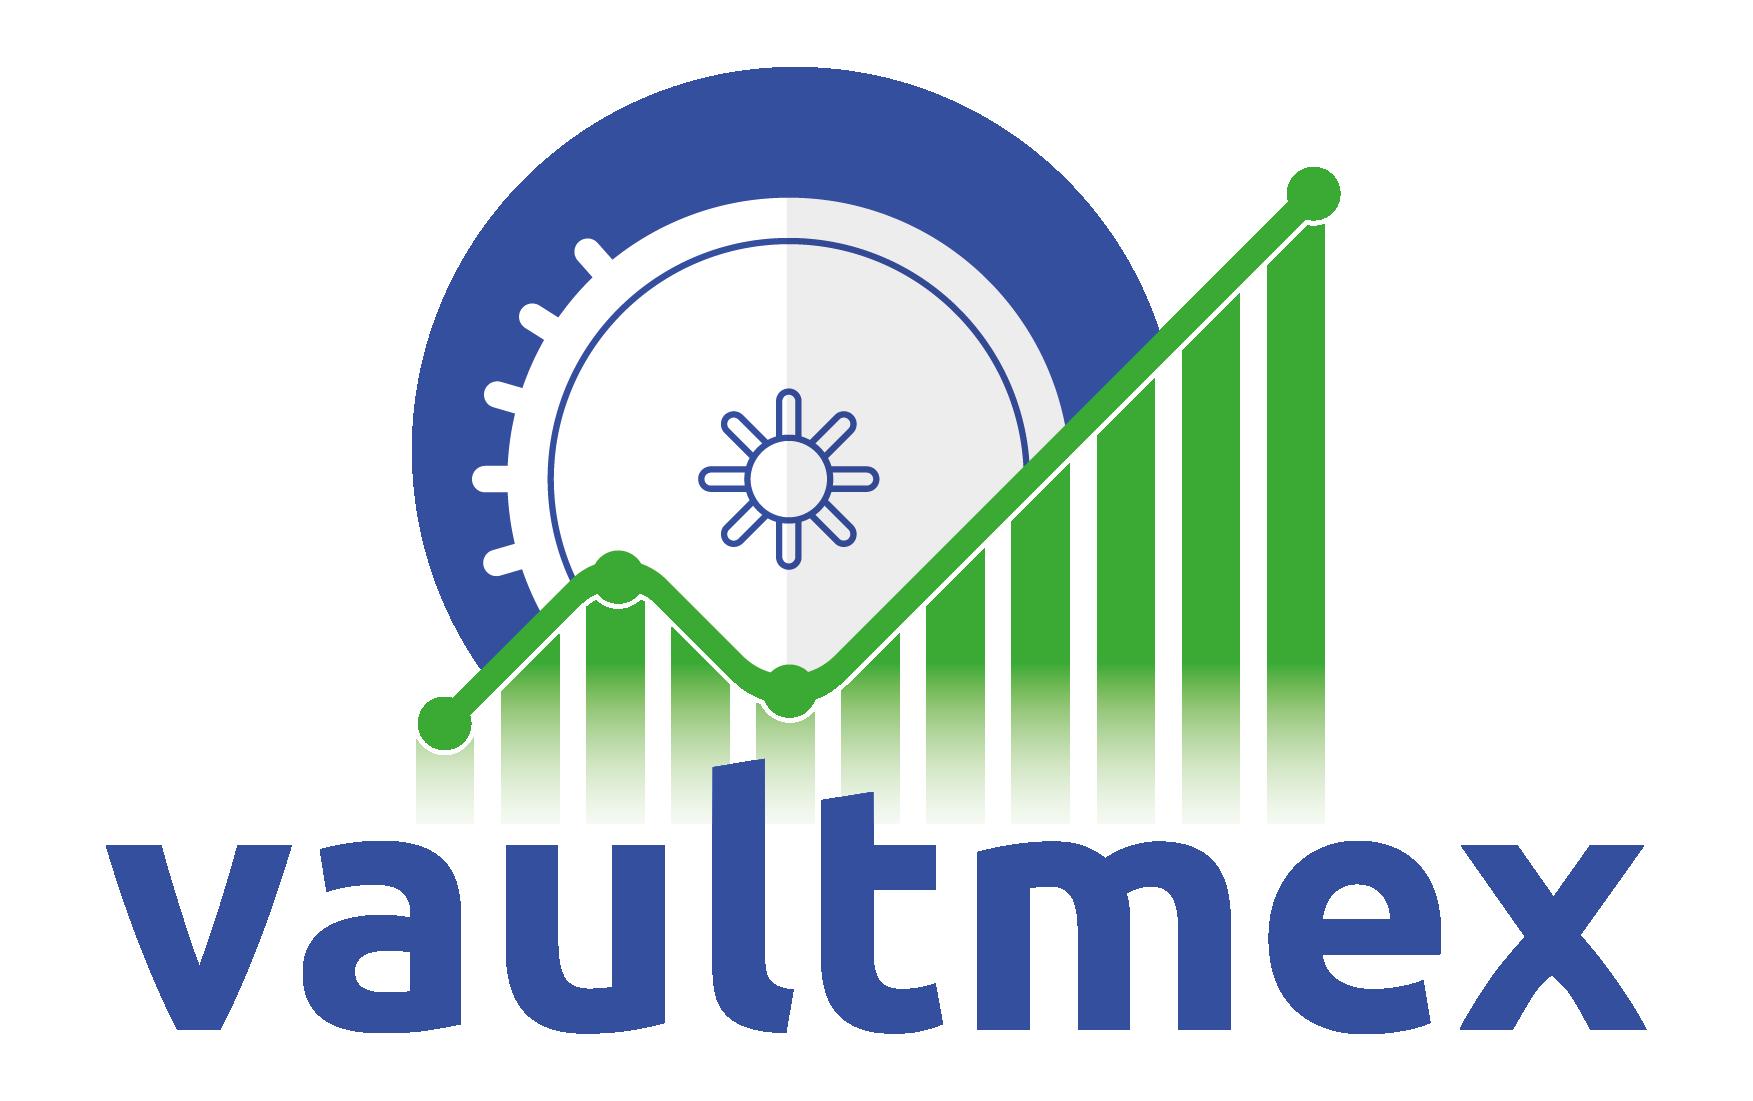 VAULTMEX.COM